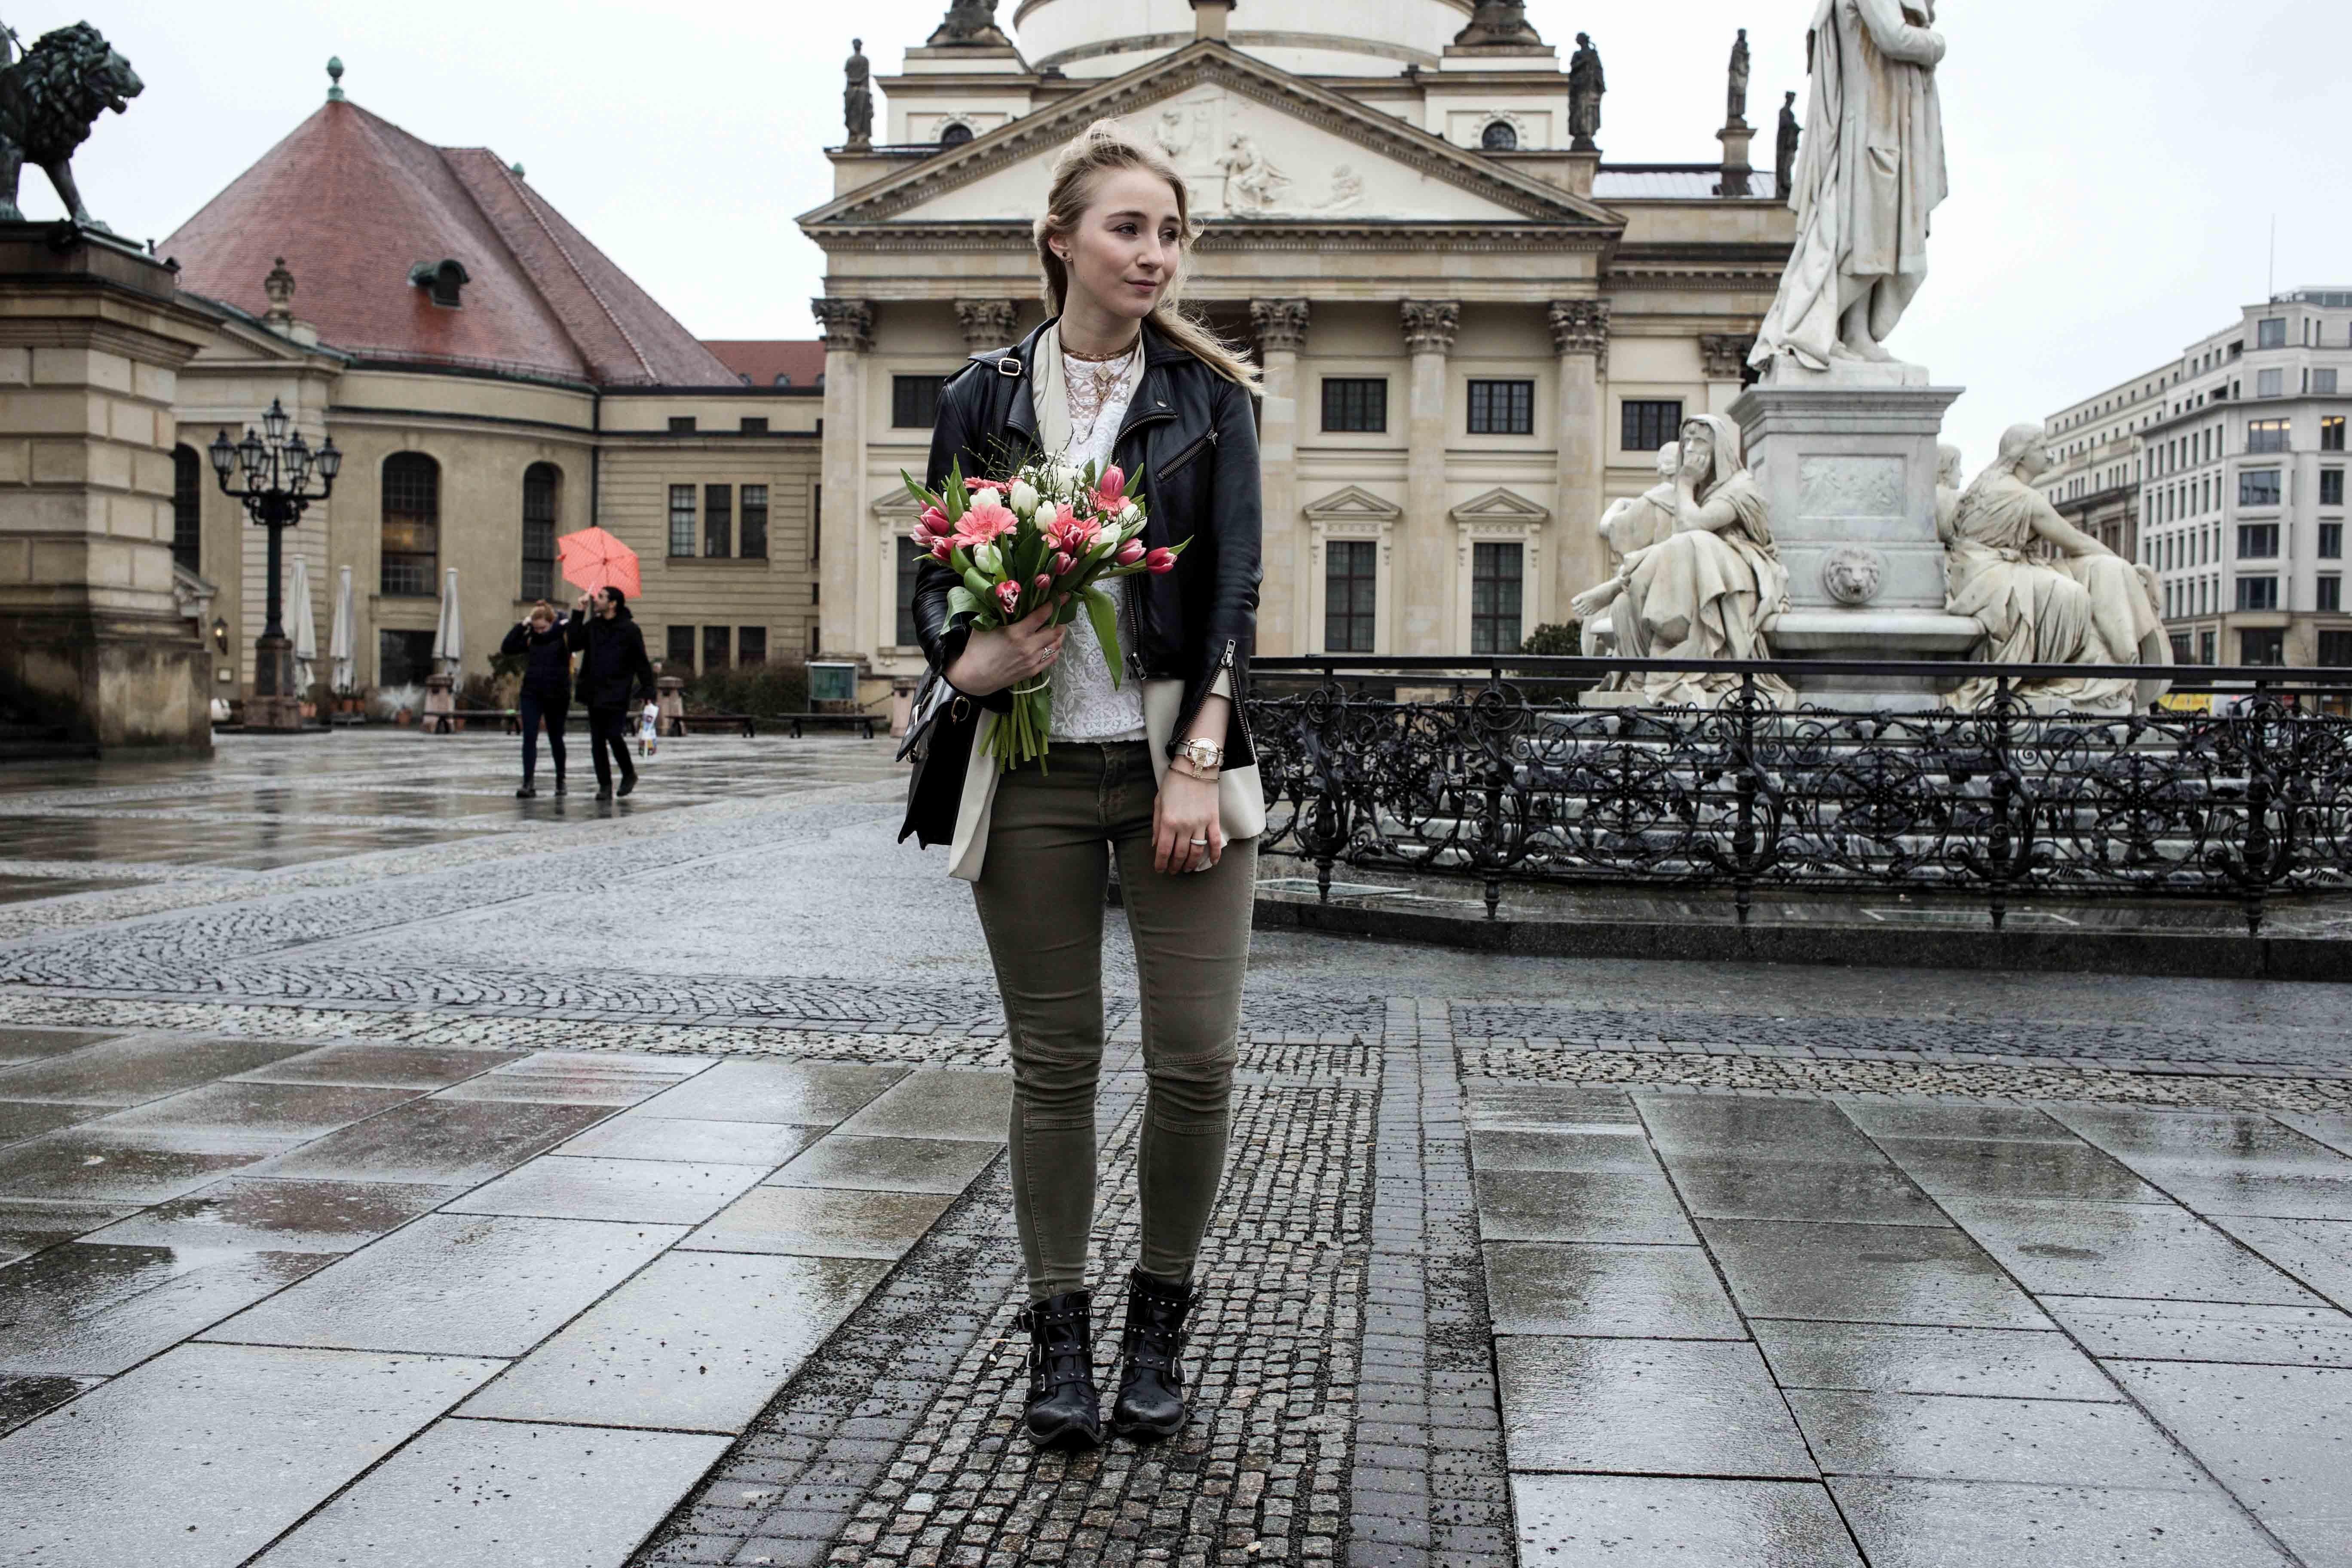 grüne-biker-jeans-geburtstags-outfit-lederjacke-berlin-gendarmenmarkt-modeblogger-fashionblog_0402